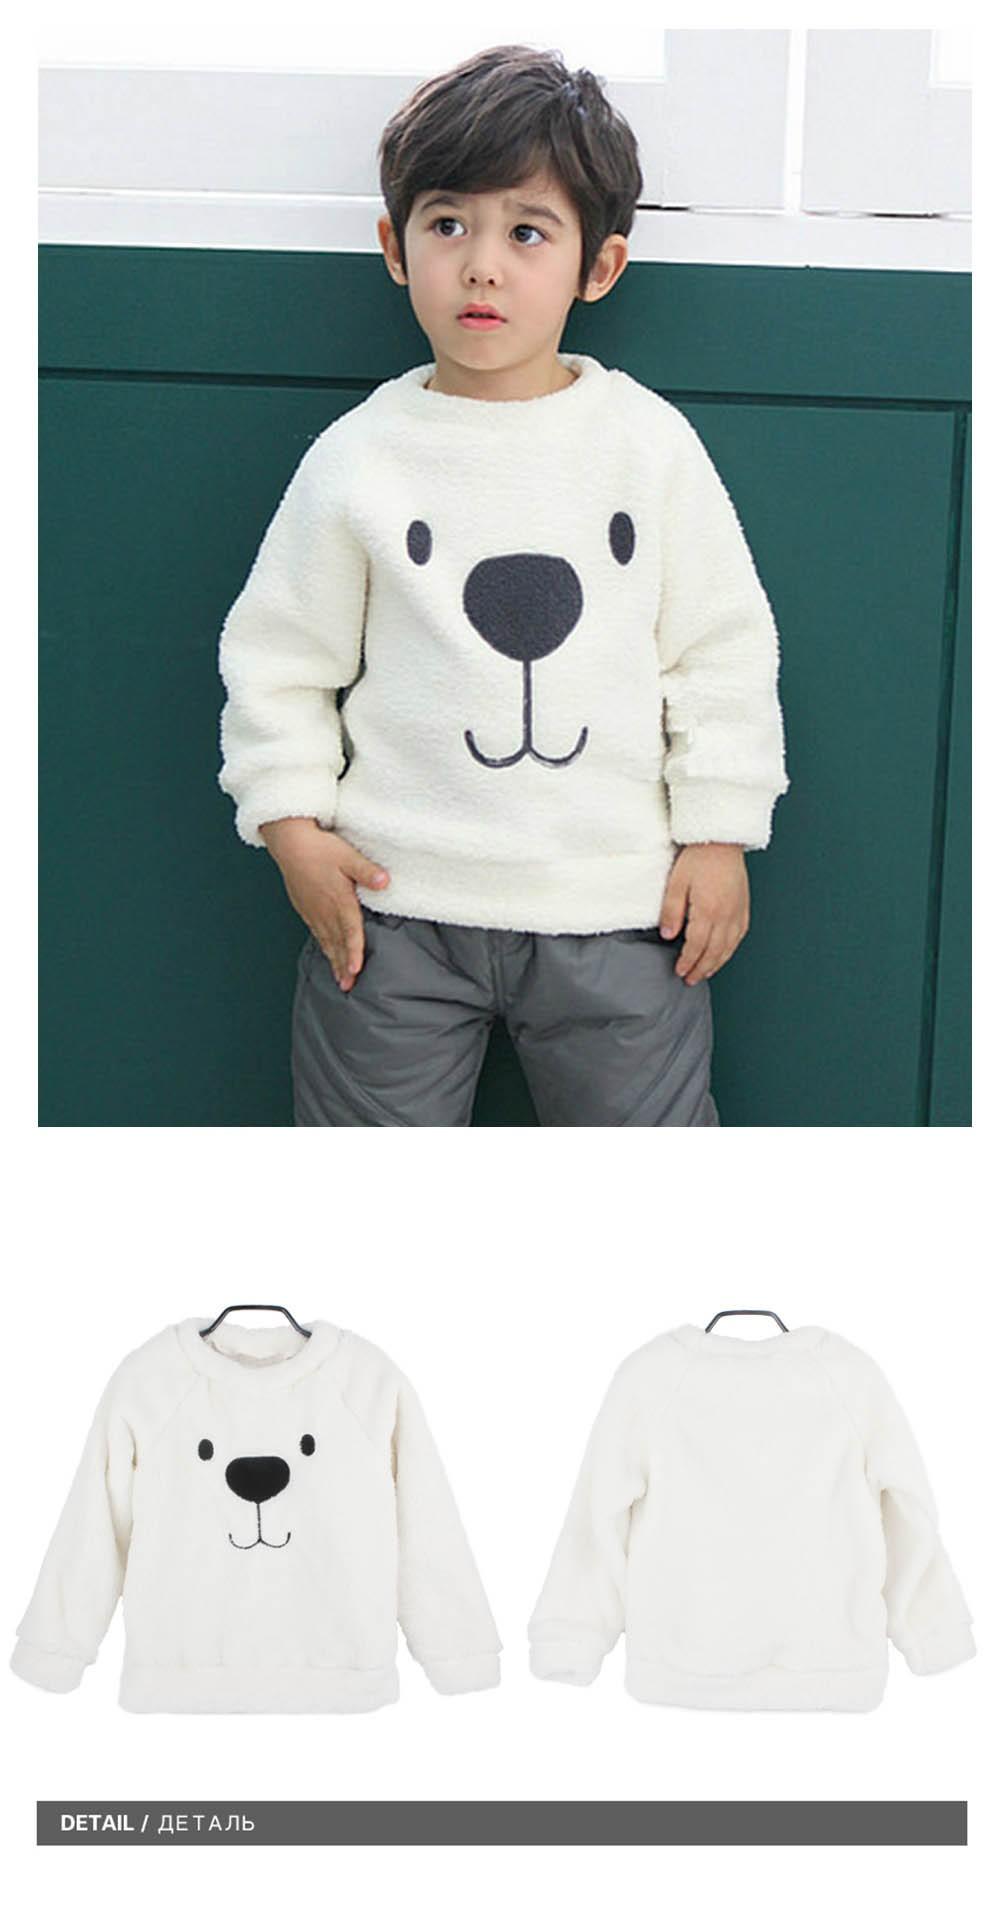 079f8bda0 Newborn Winter Warm Thick Fleece Baby Sweaters Infant Cute Cartoon ...